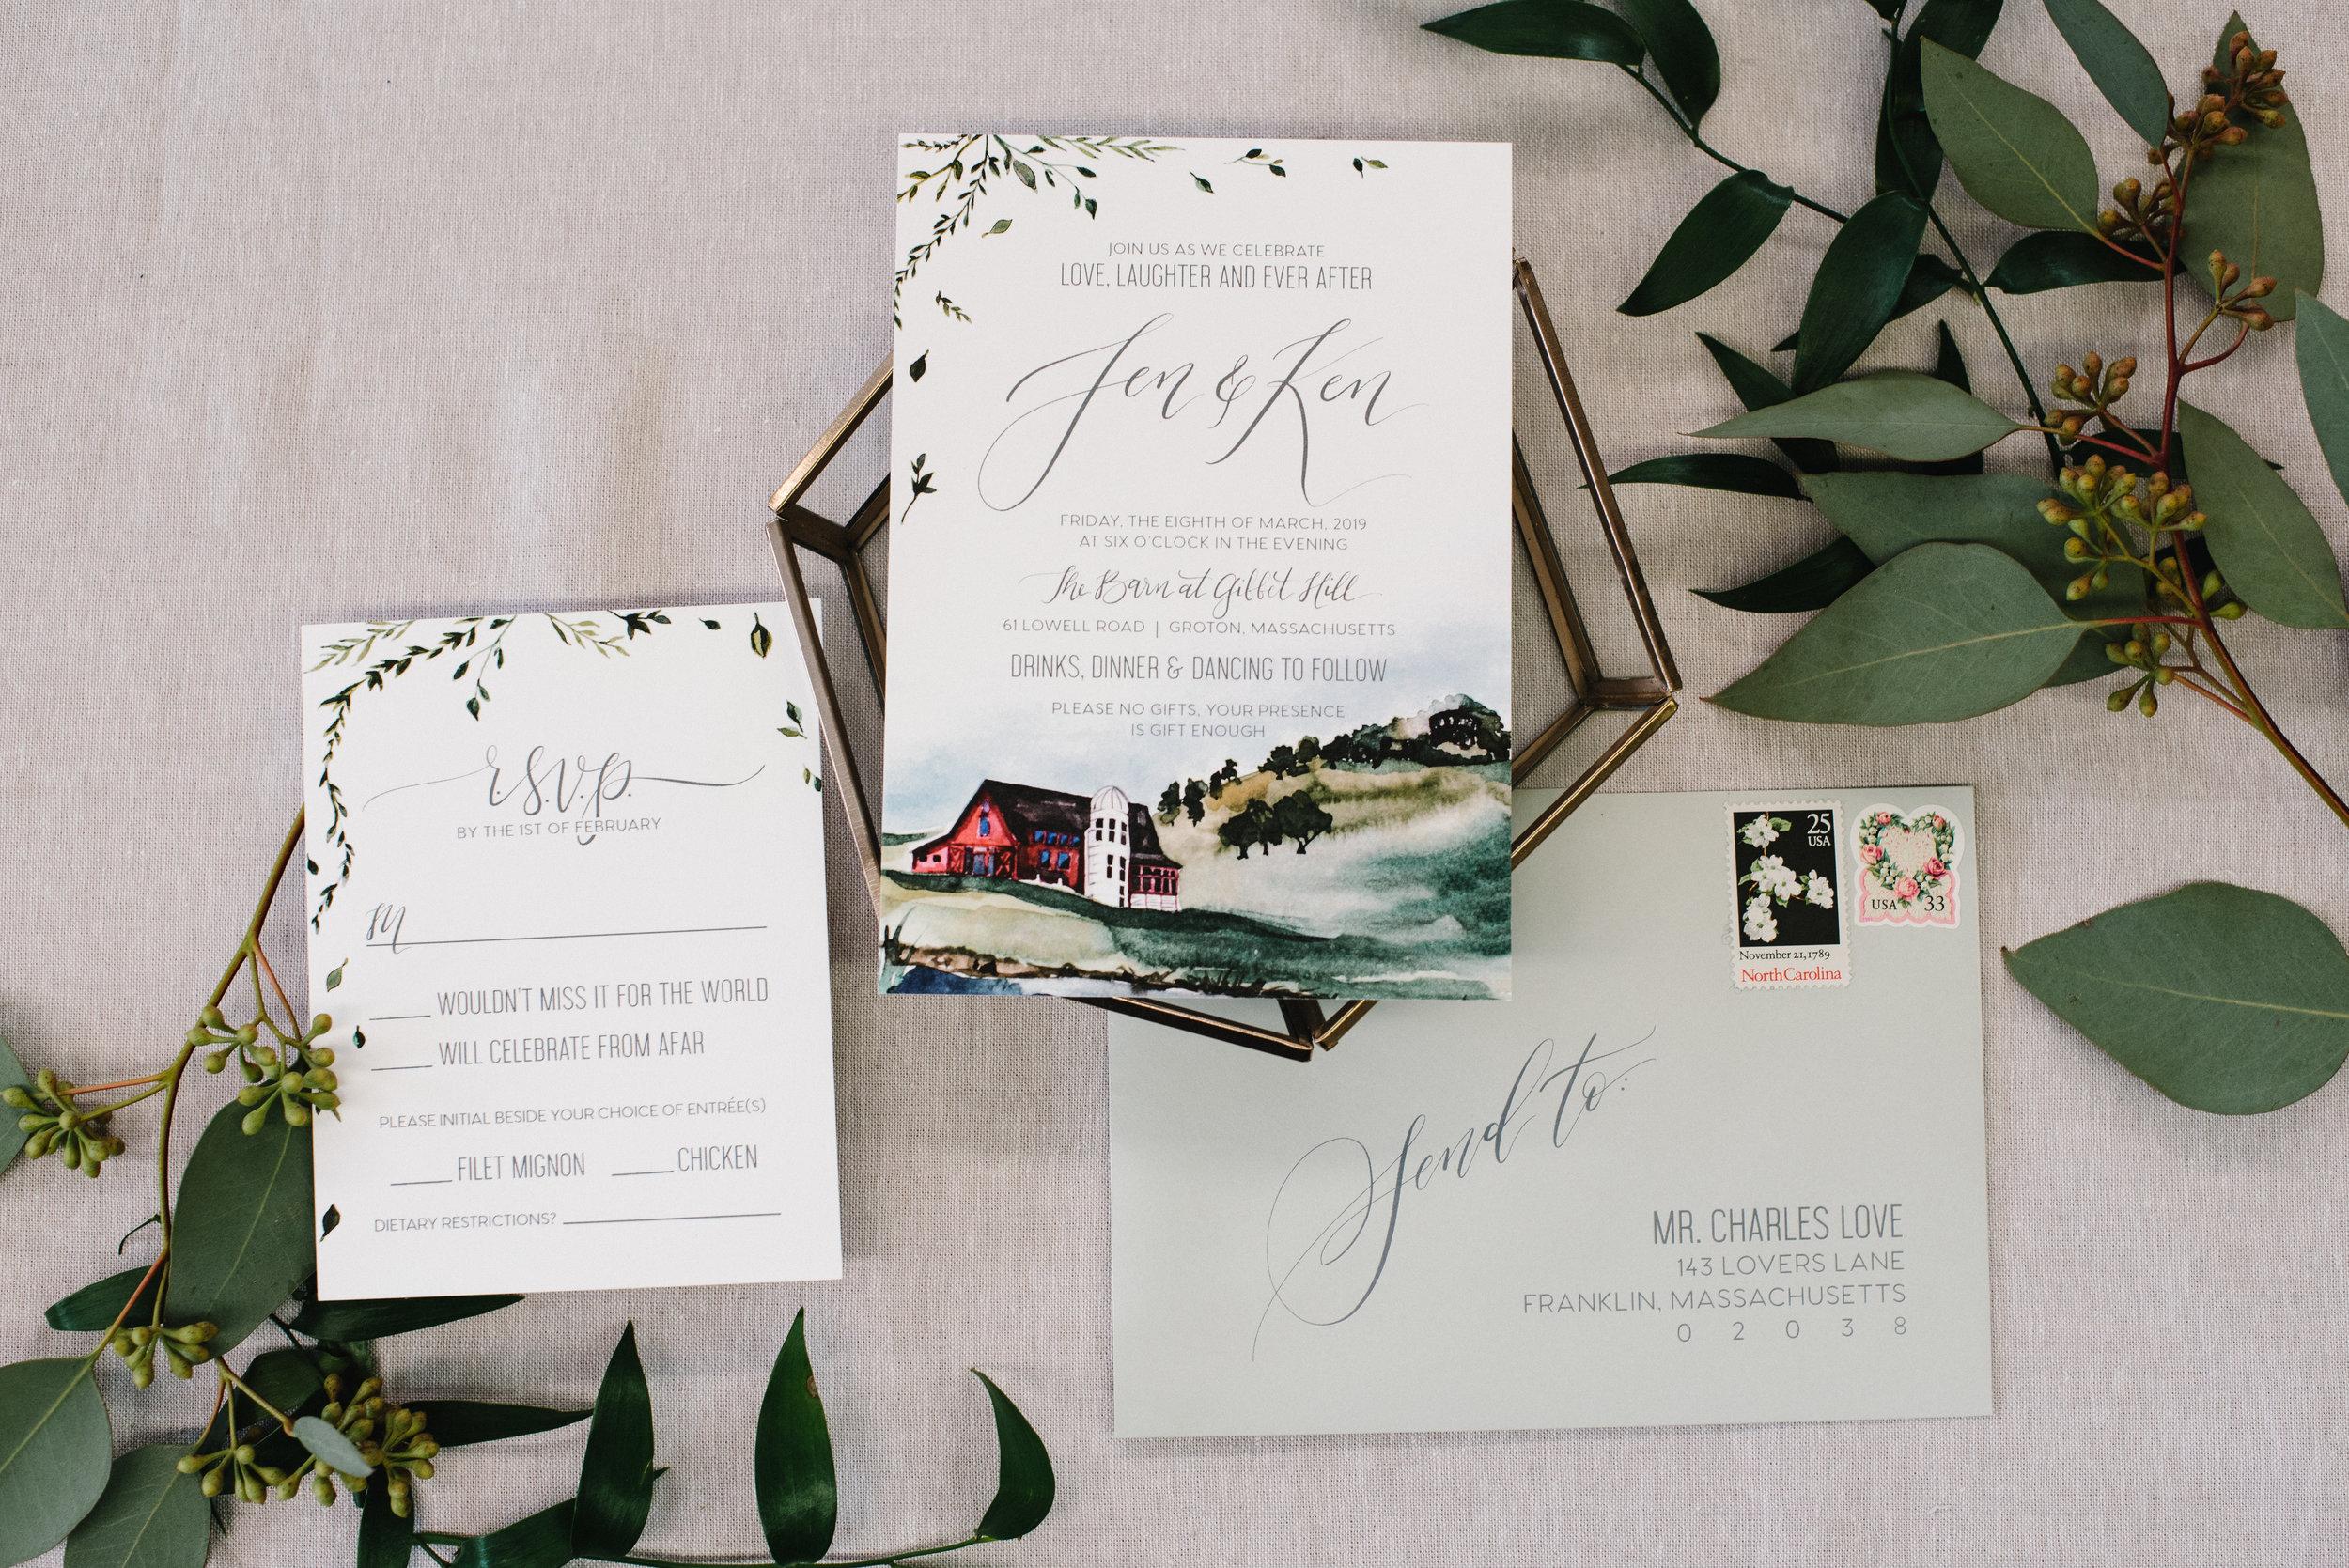 GIBBET HILL, GROTON, WATERCOLOR WEDDING INVITATIONS